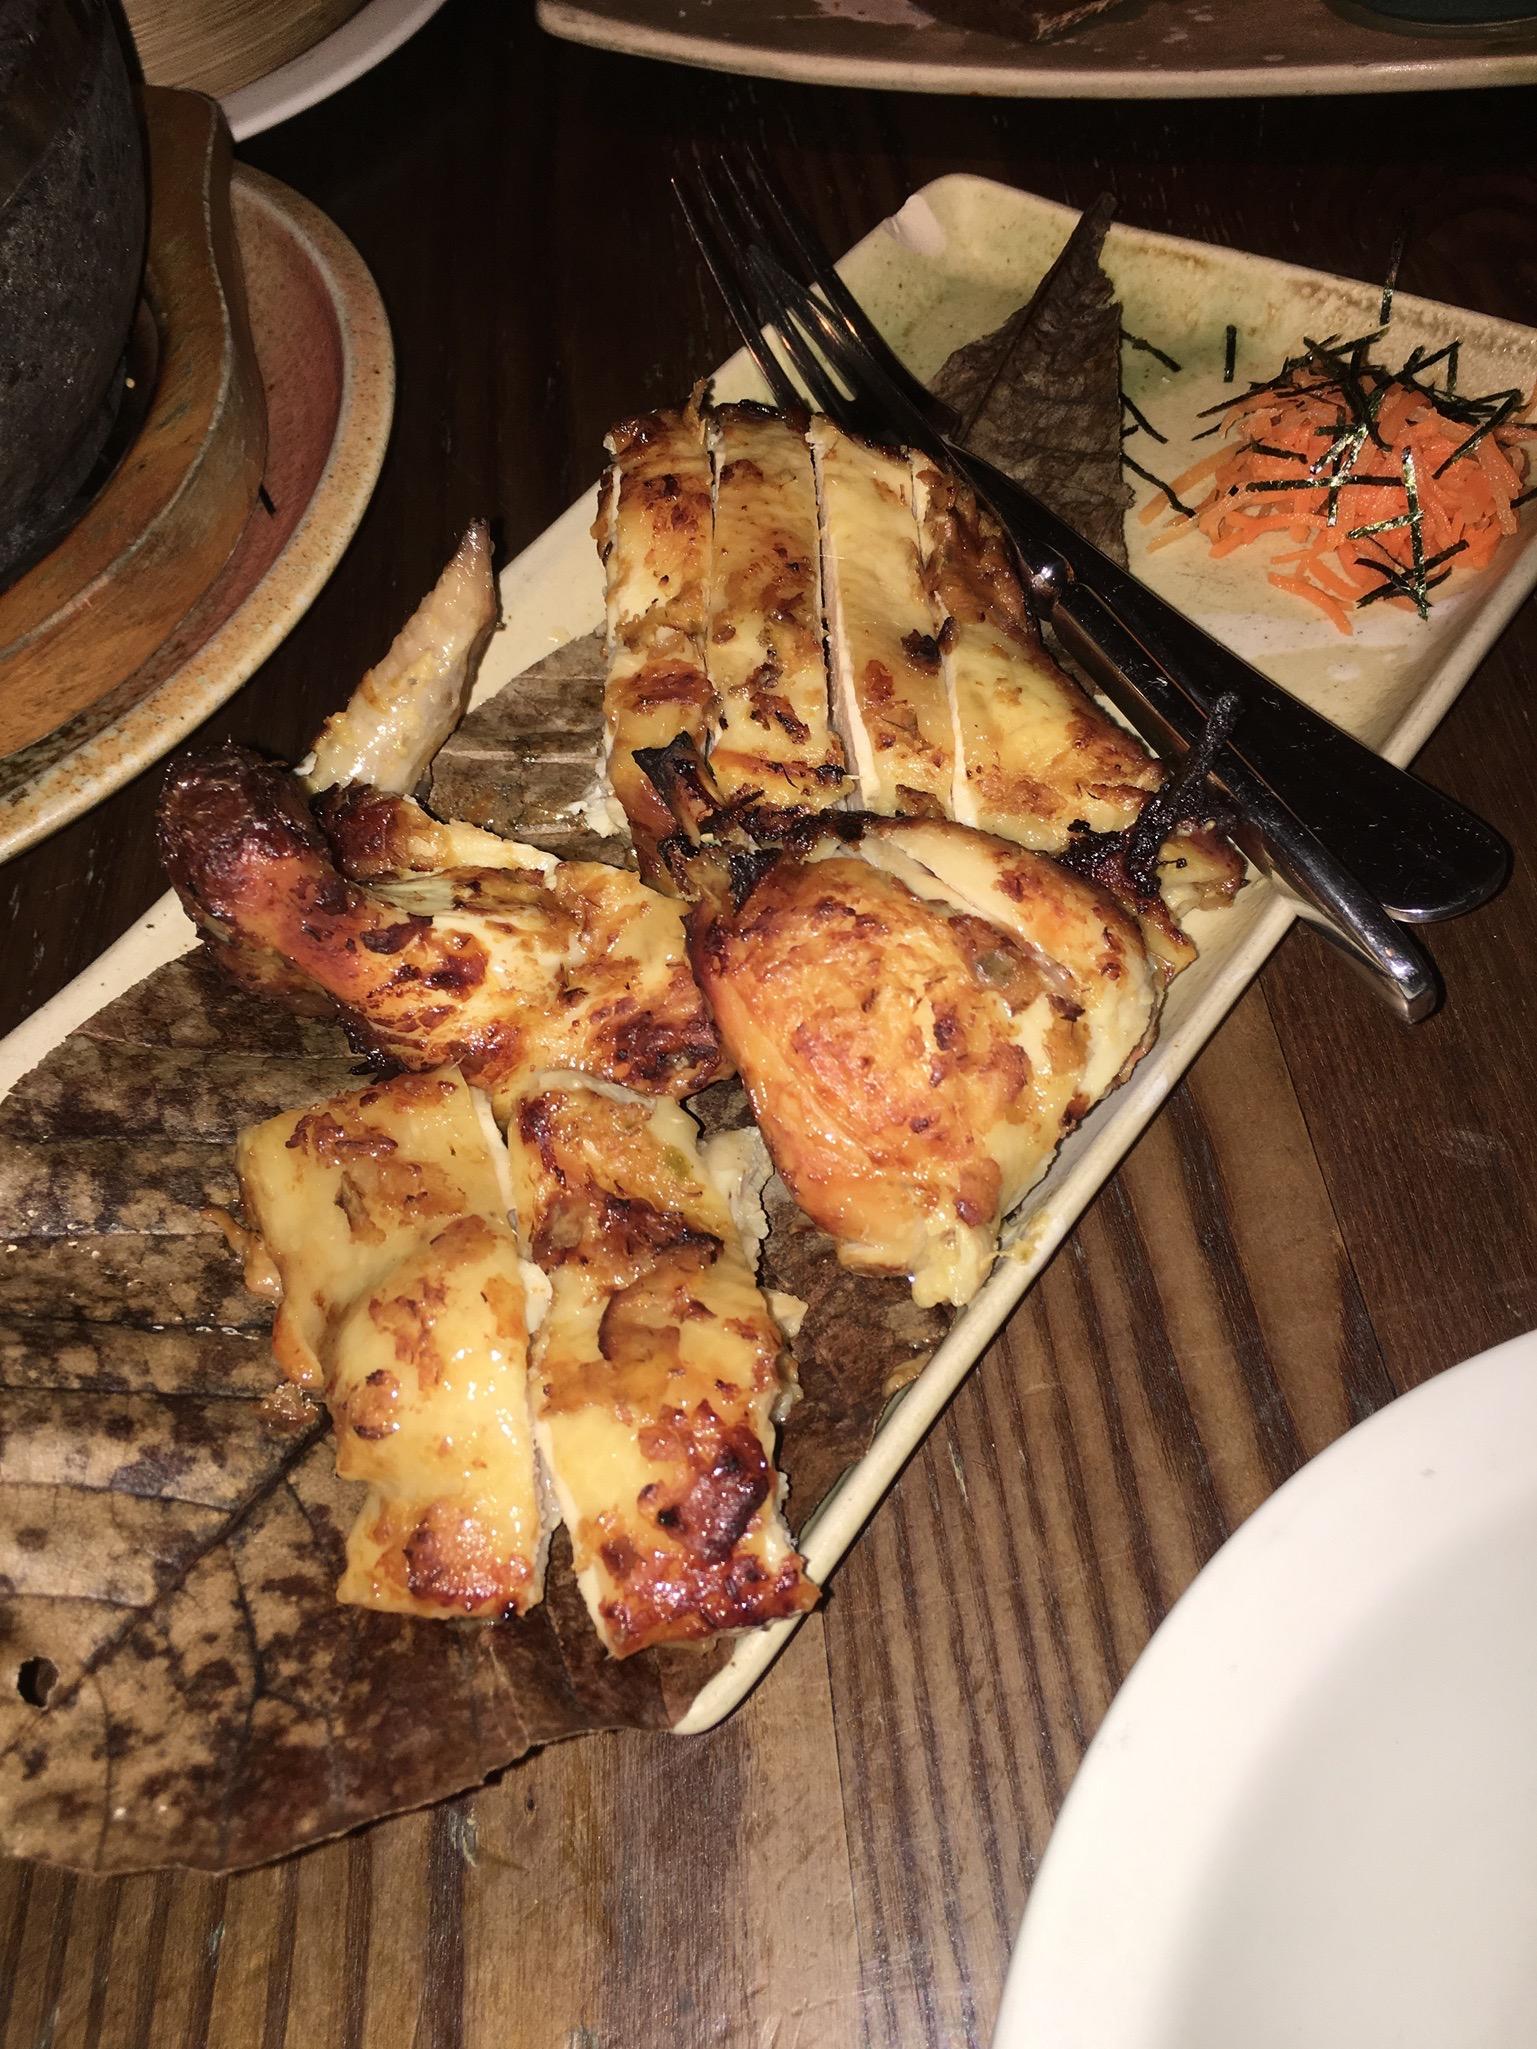 LondonsDiningCouple Flesh & Buns Review | Top 10 Restaurants in London 2017